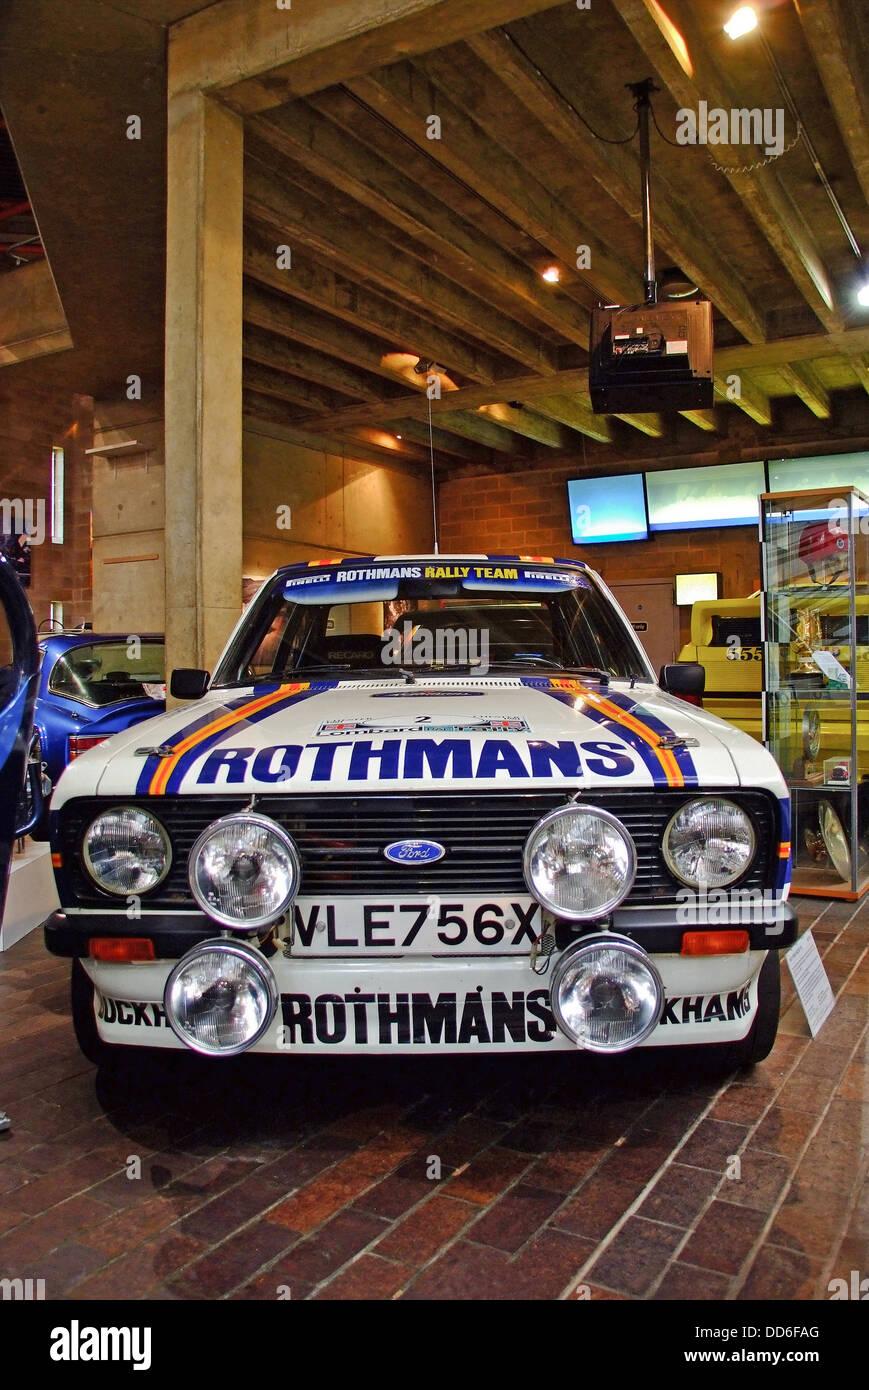 Rothmans Mk2 Ford Escort Rally Car Stock Photo, Royalty Free Image ...